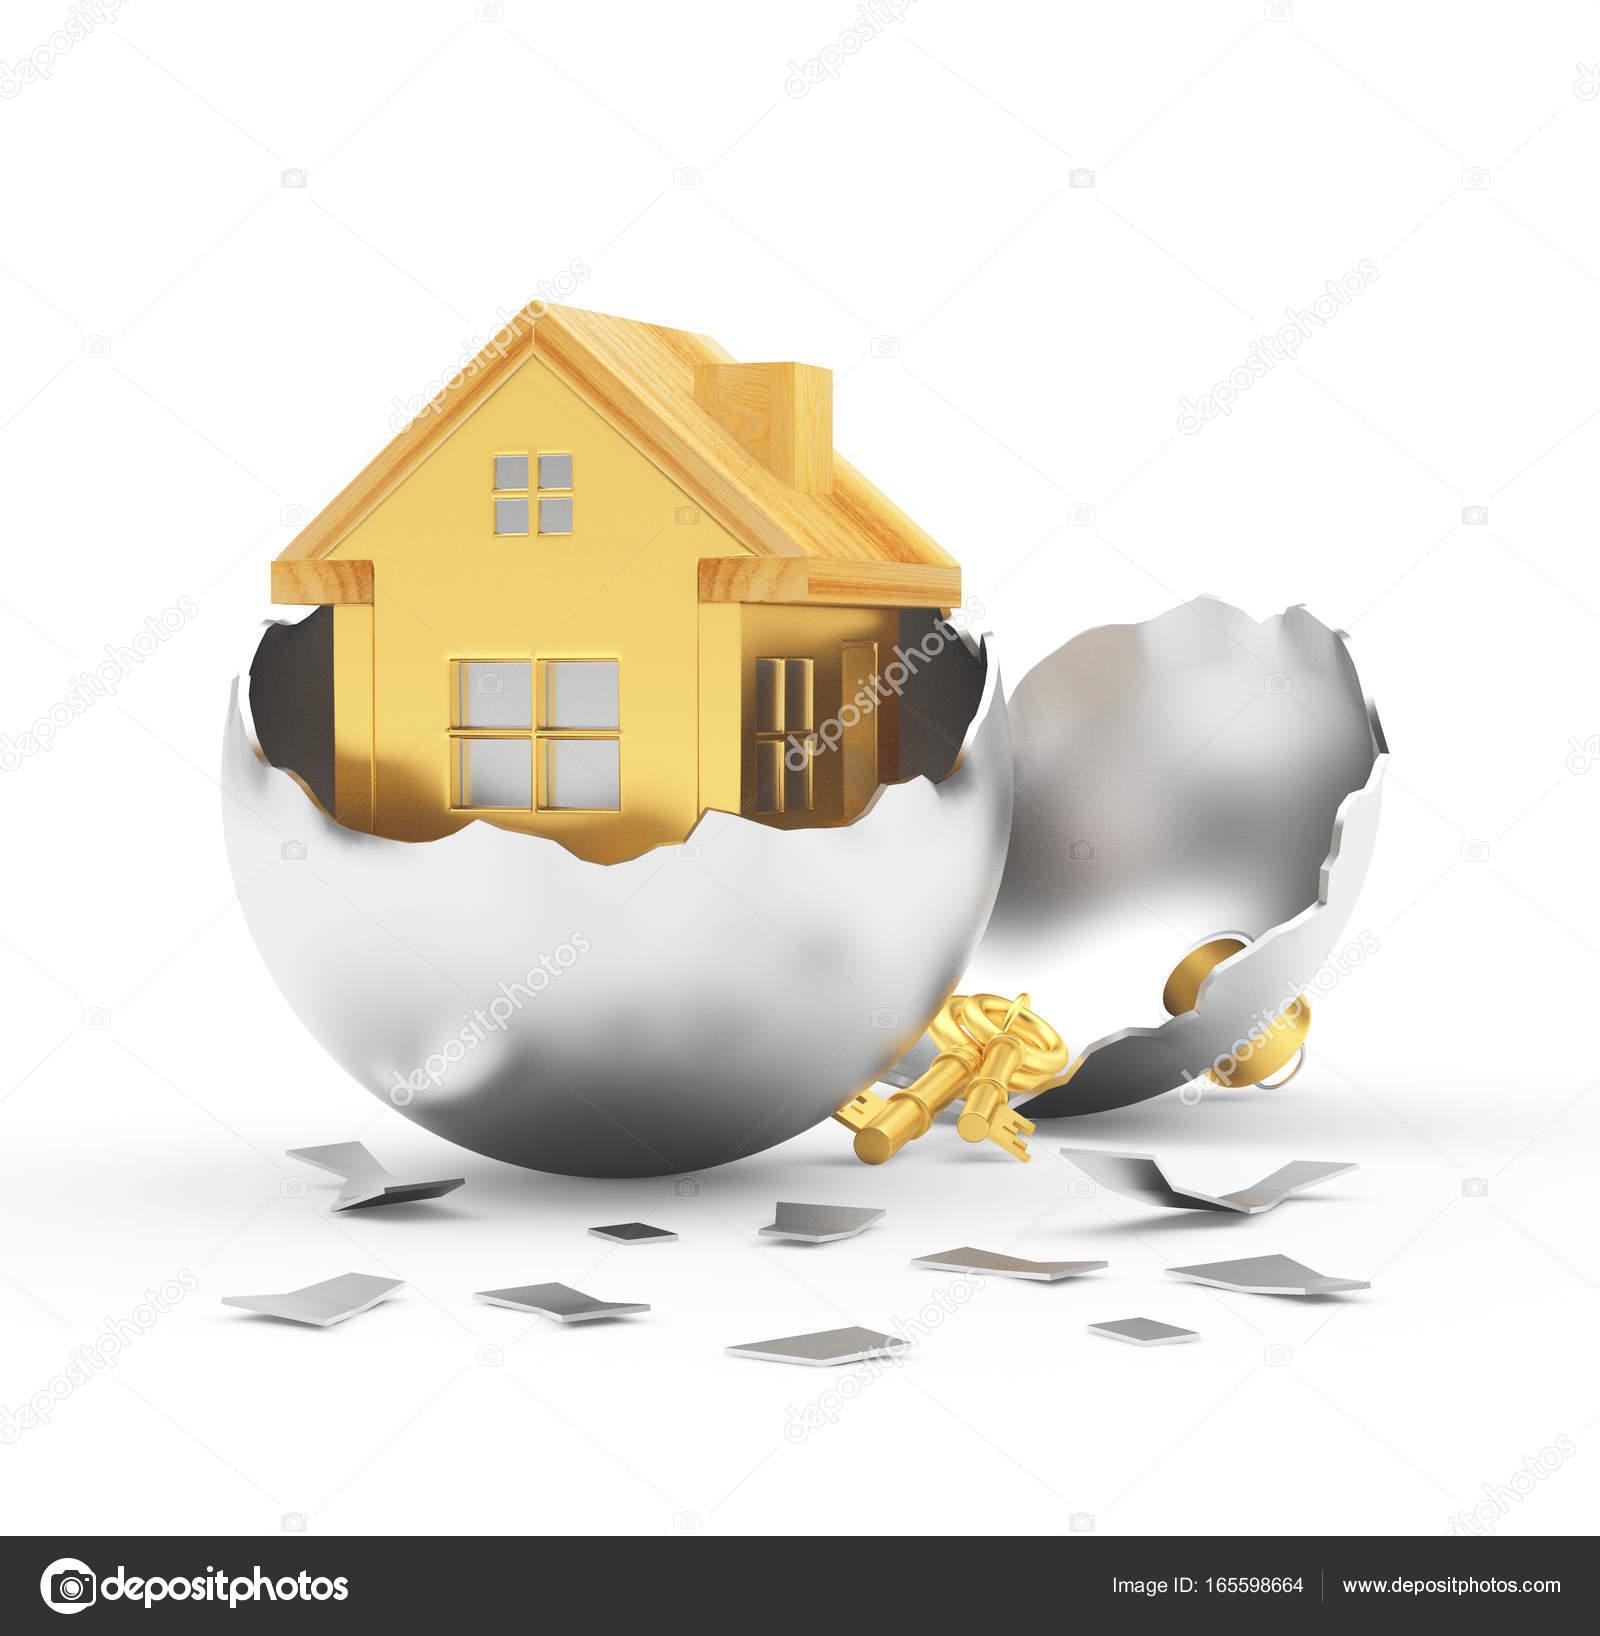 Broken silver christmas ball with golden house inside isolated on white background 3d illustration photo by rashevskiy yandex ru